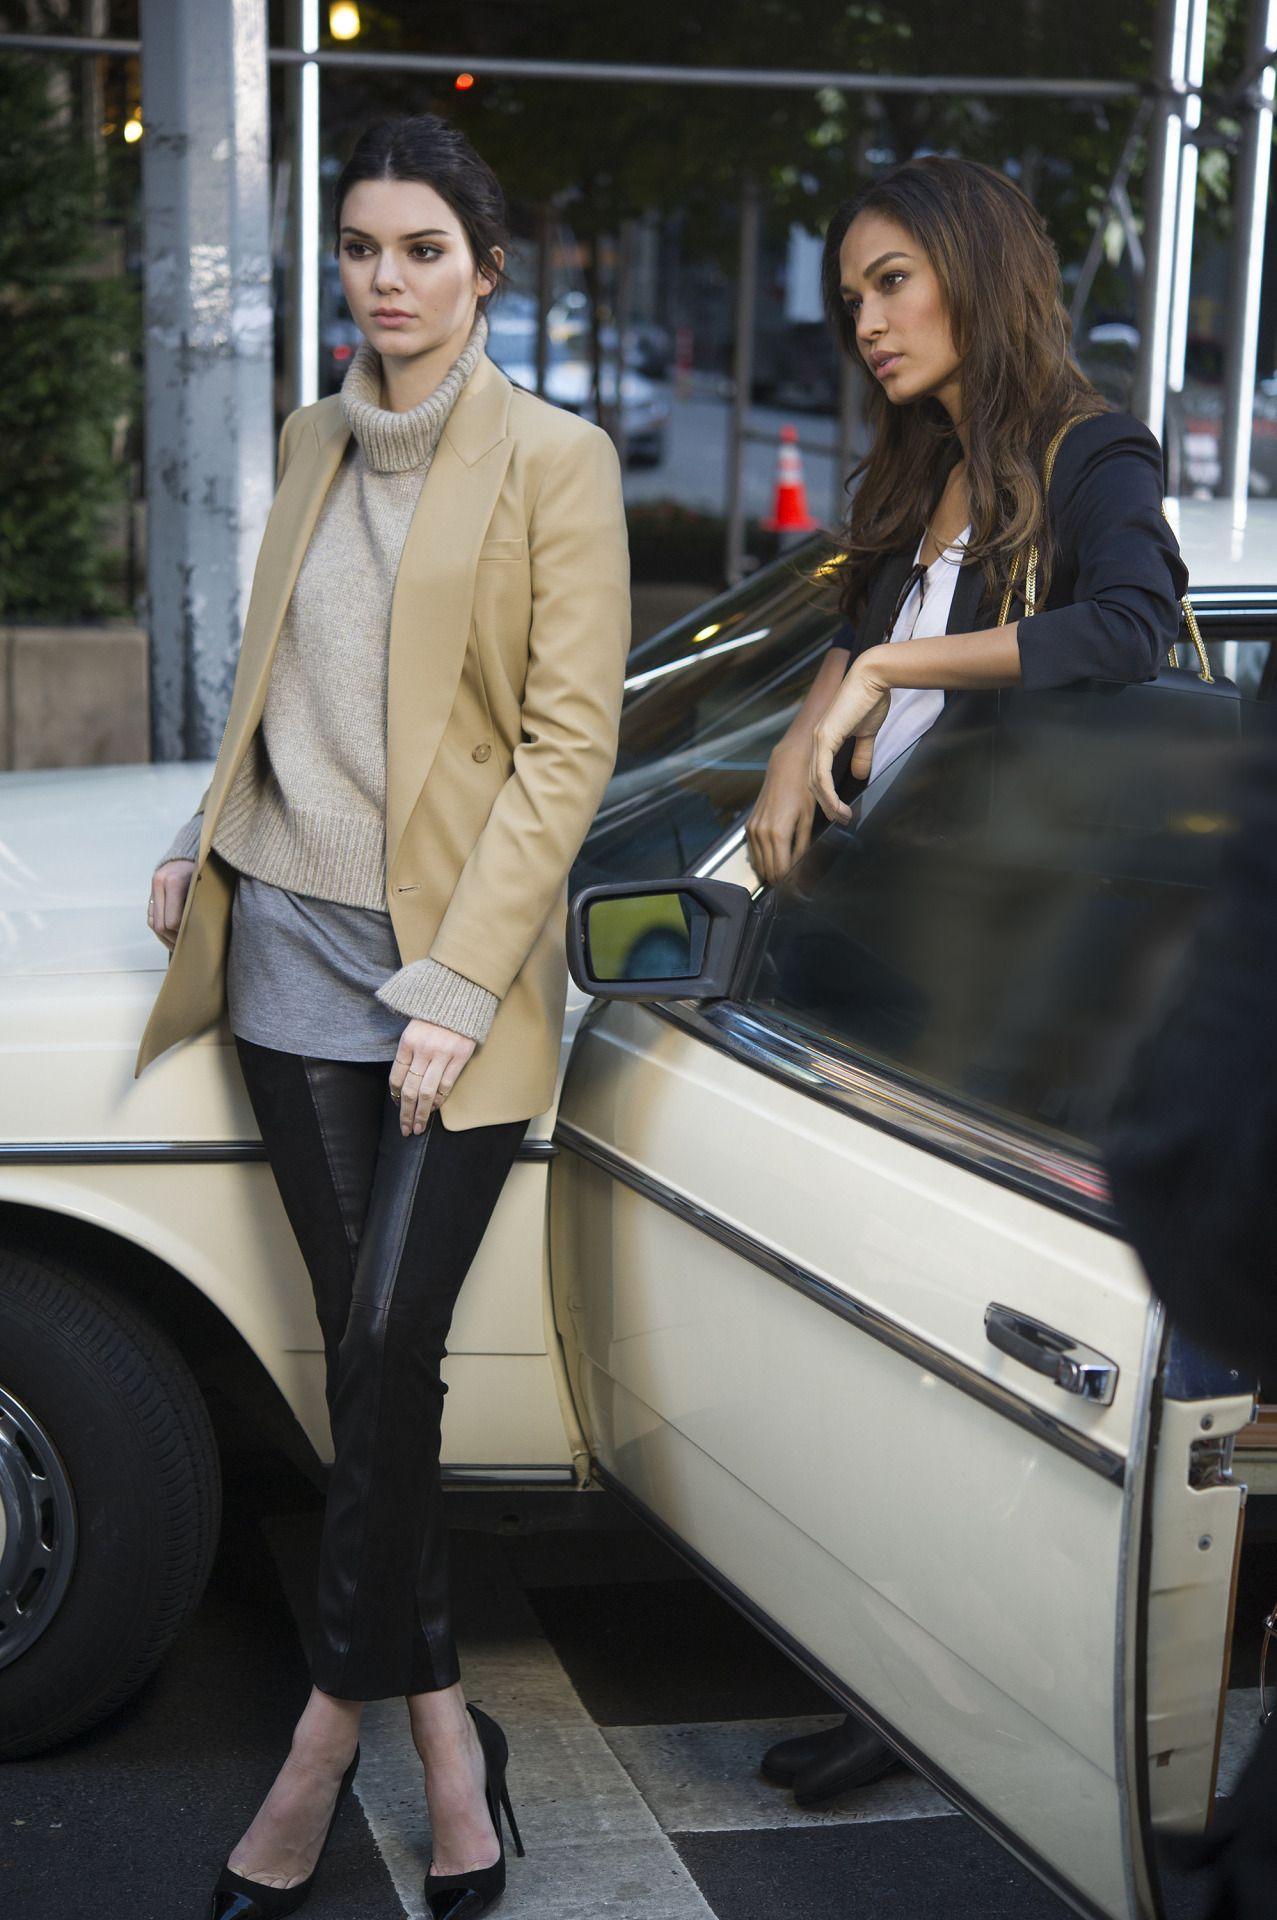 Kendall and Joan for Estée Lauder